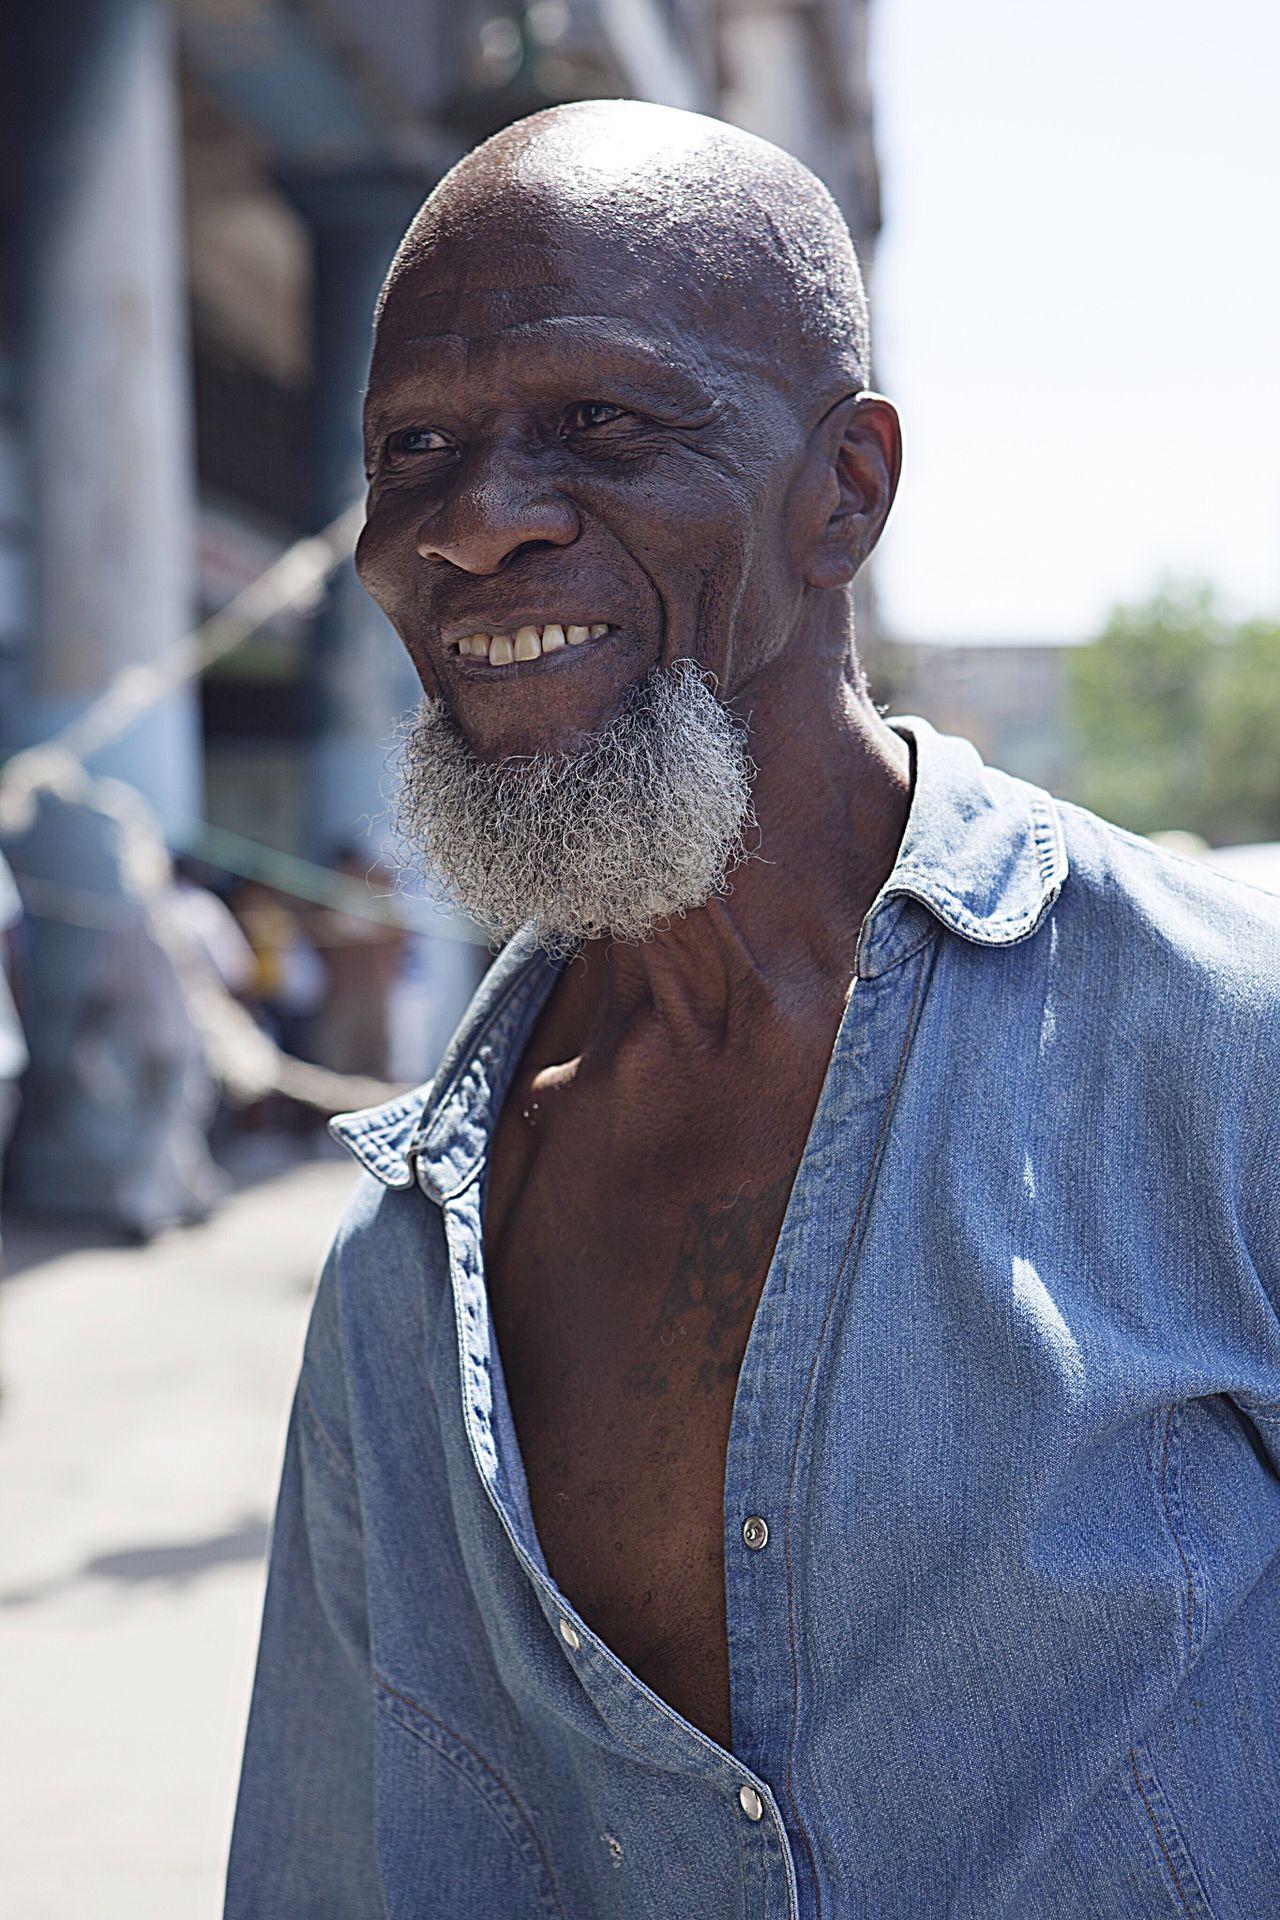 Cuba Havana Cuban Cuban Man Portrait Portrait Of A Cuban Travel Street Photography Portrait Photography Up Close Street Photography Telling Stories Differently Fine Art Photography The Portraitist - 2017 EyeEm Awards The Street Photographer - 2017 EyeEm Awards